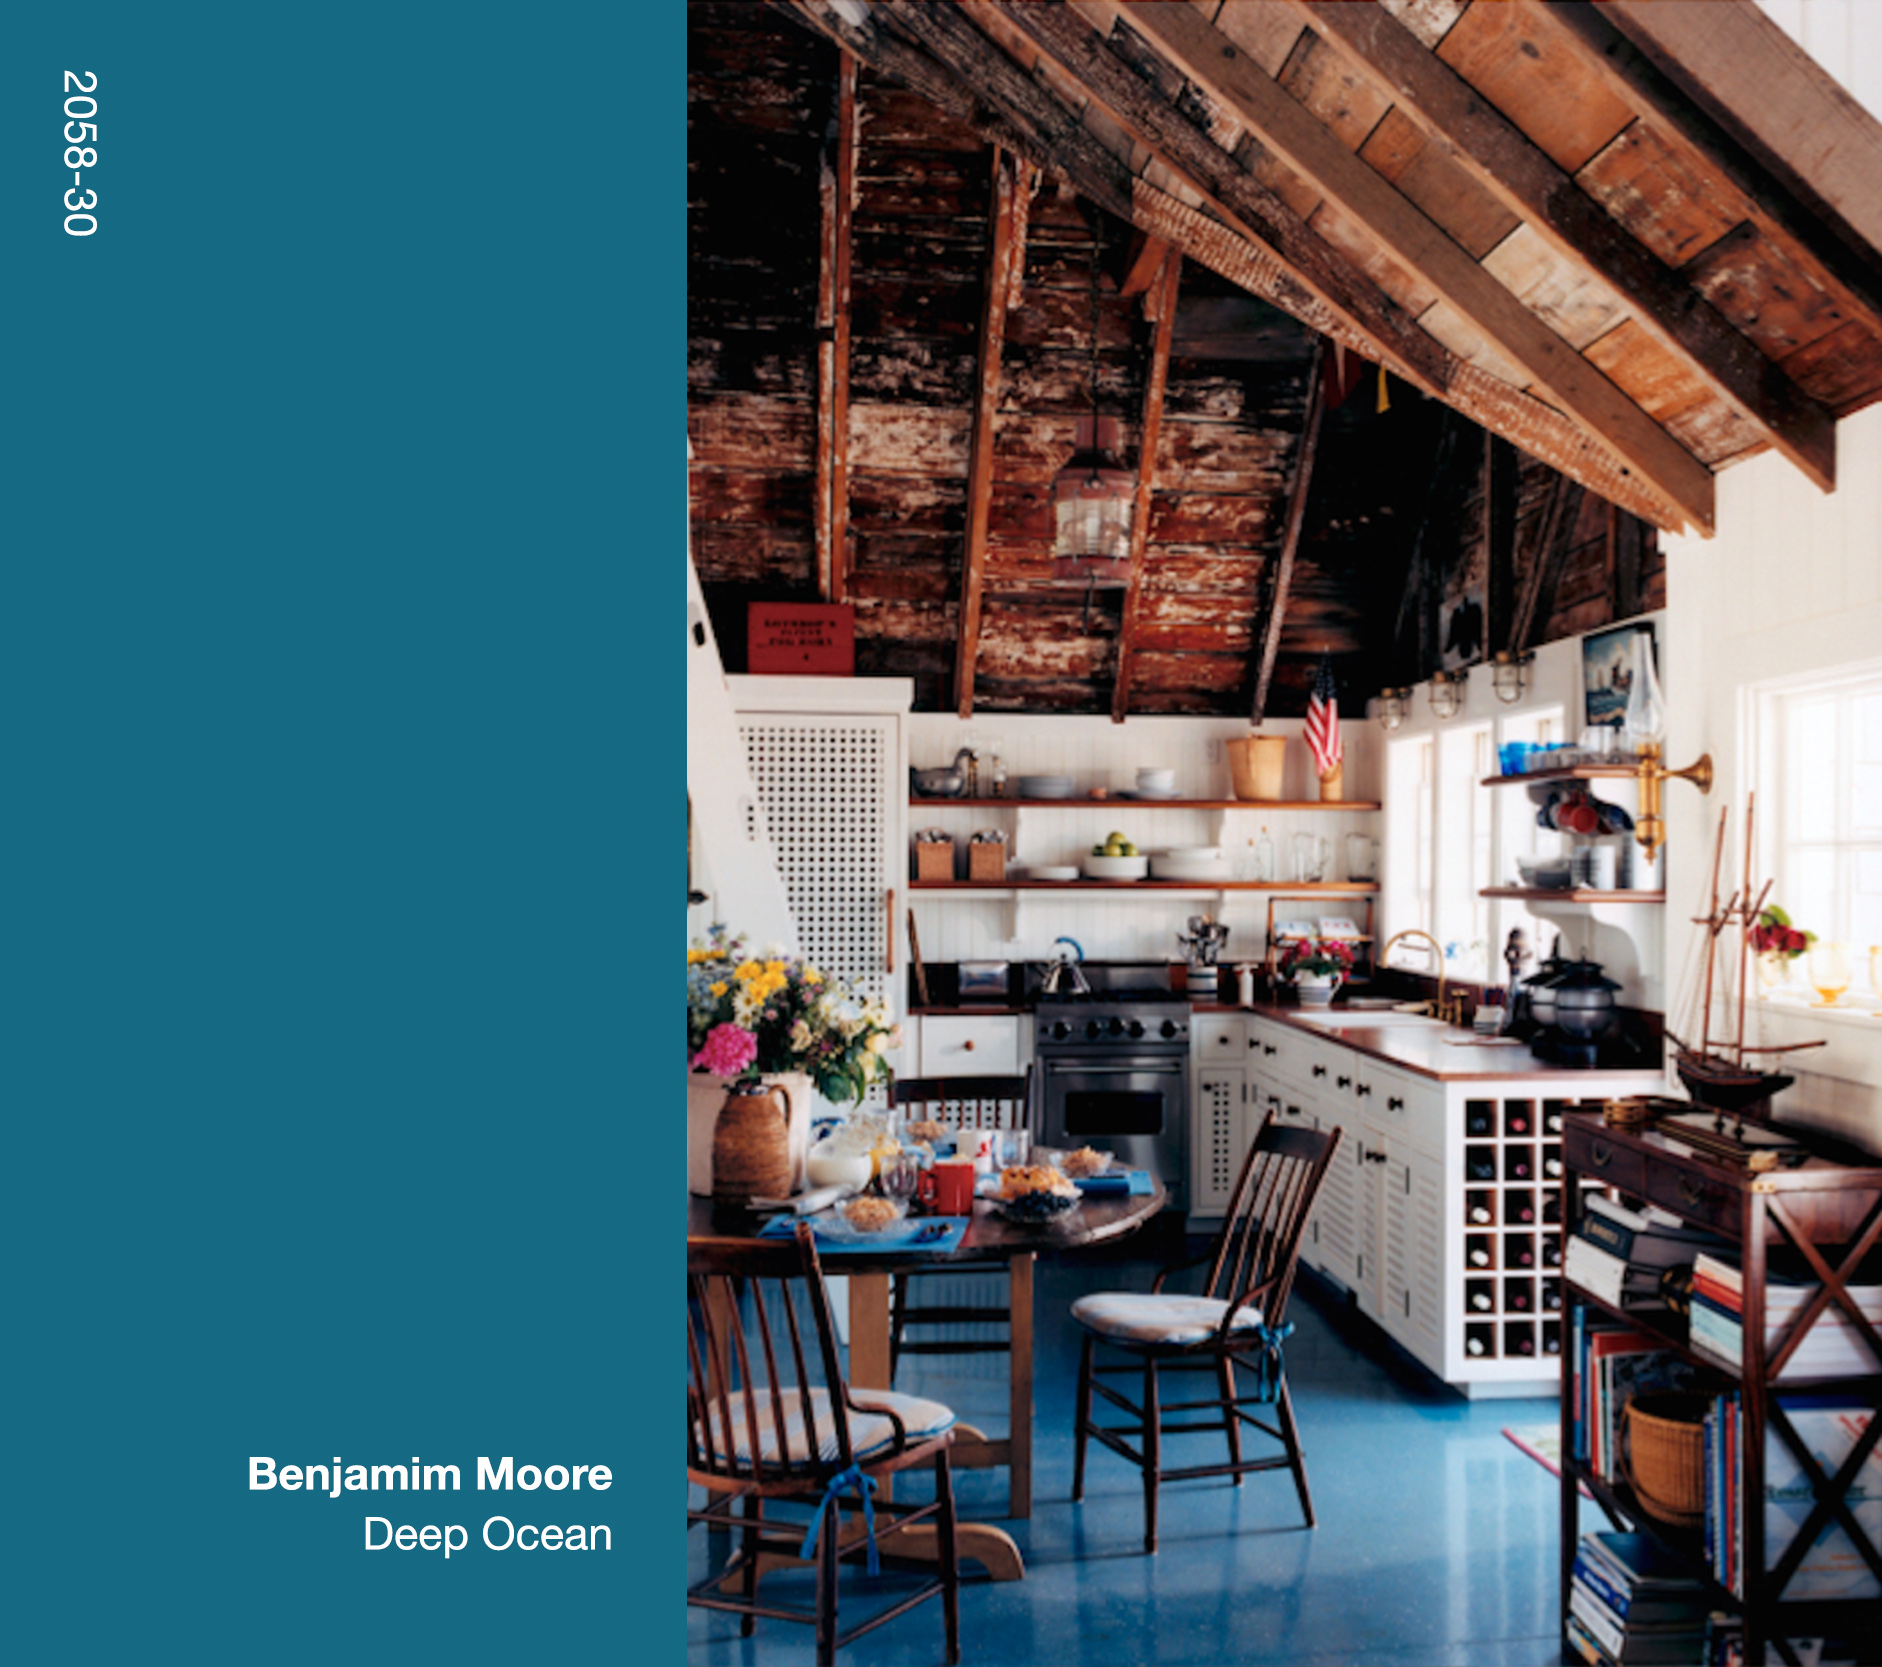 Living With Color Gary Mcbournie Inc Residential Interior Design Boston Massachusetts